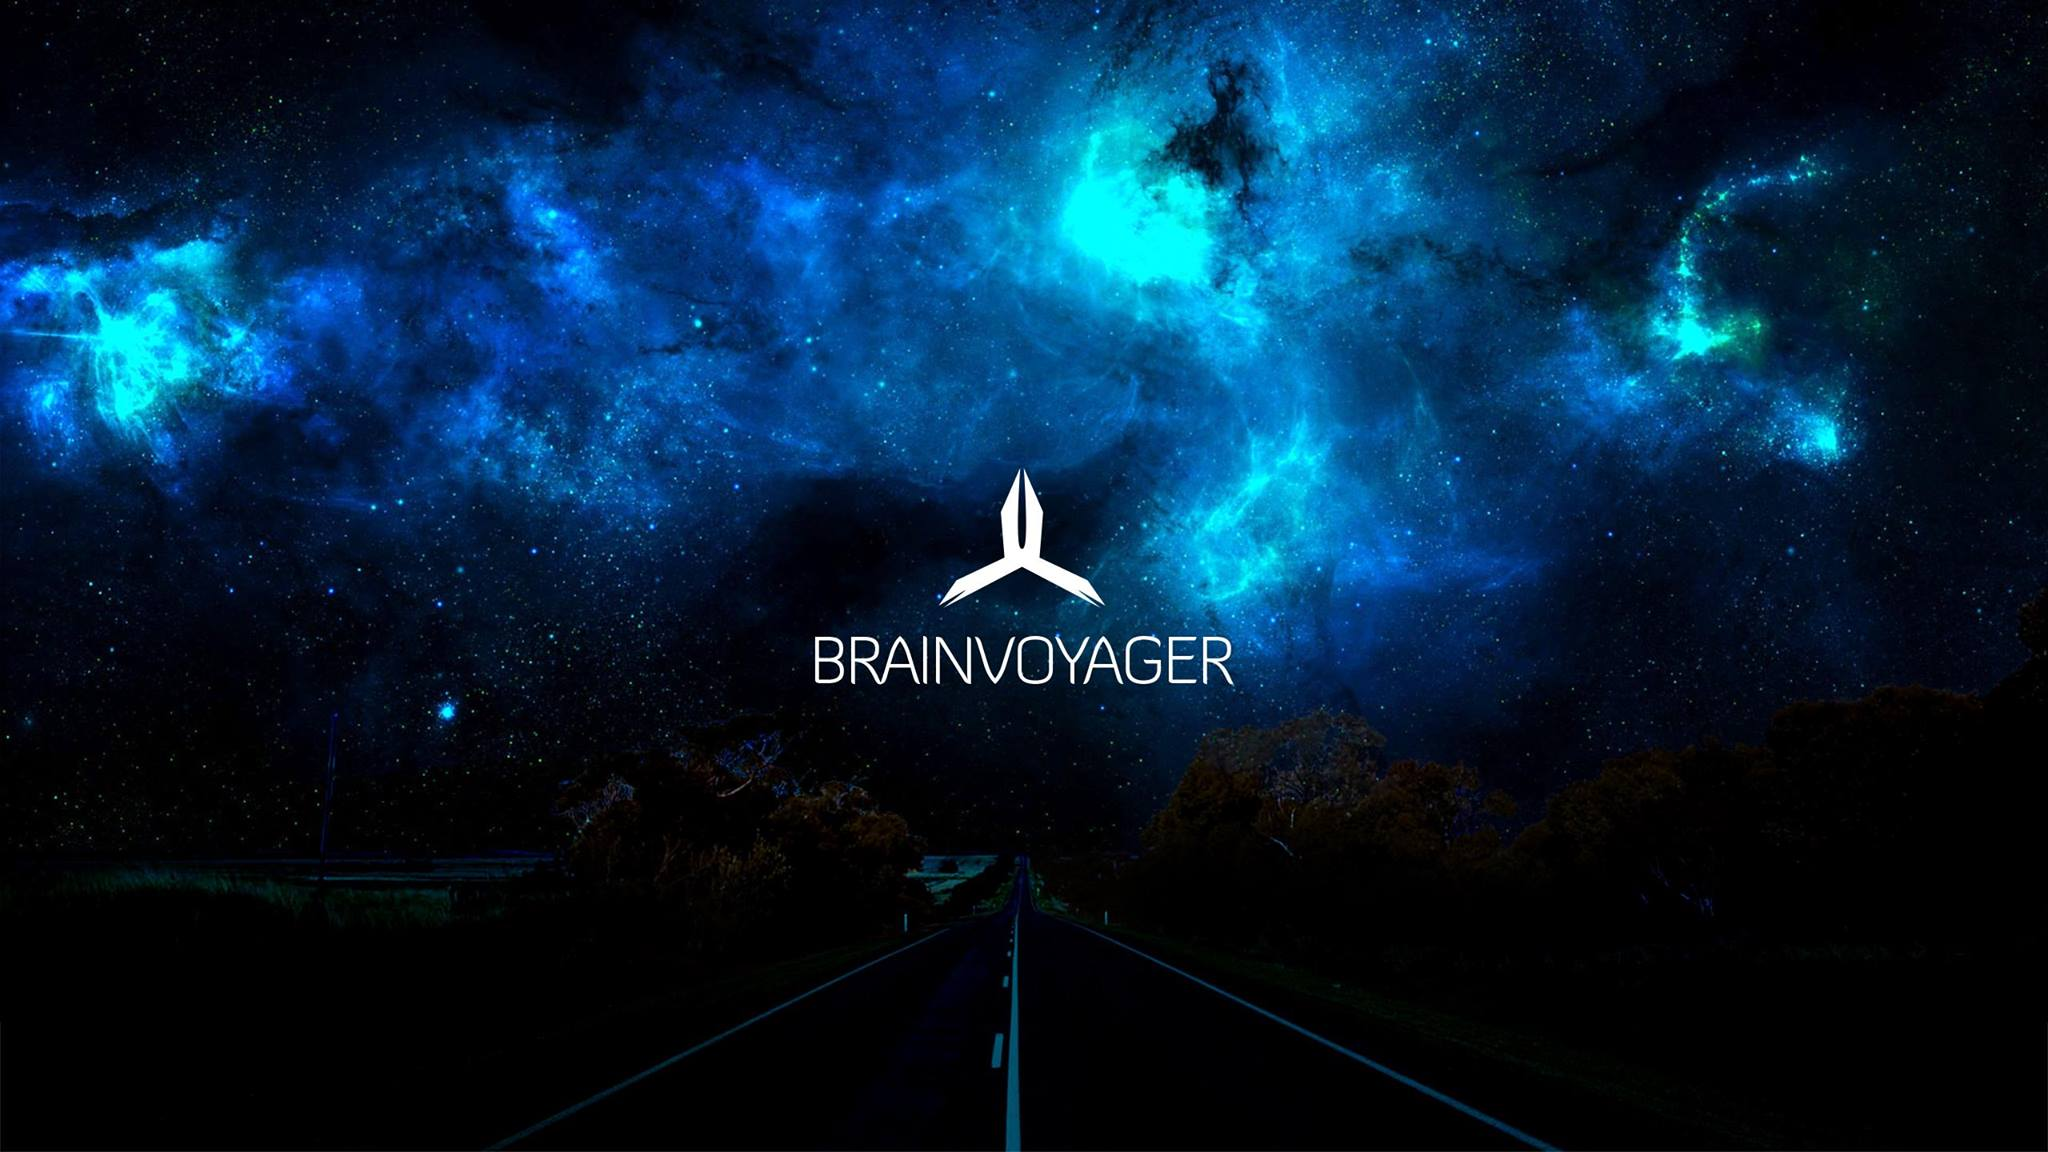 Brainvoyager